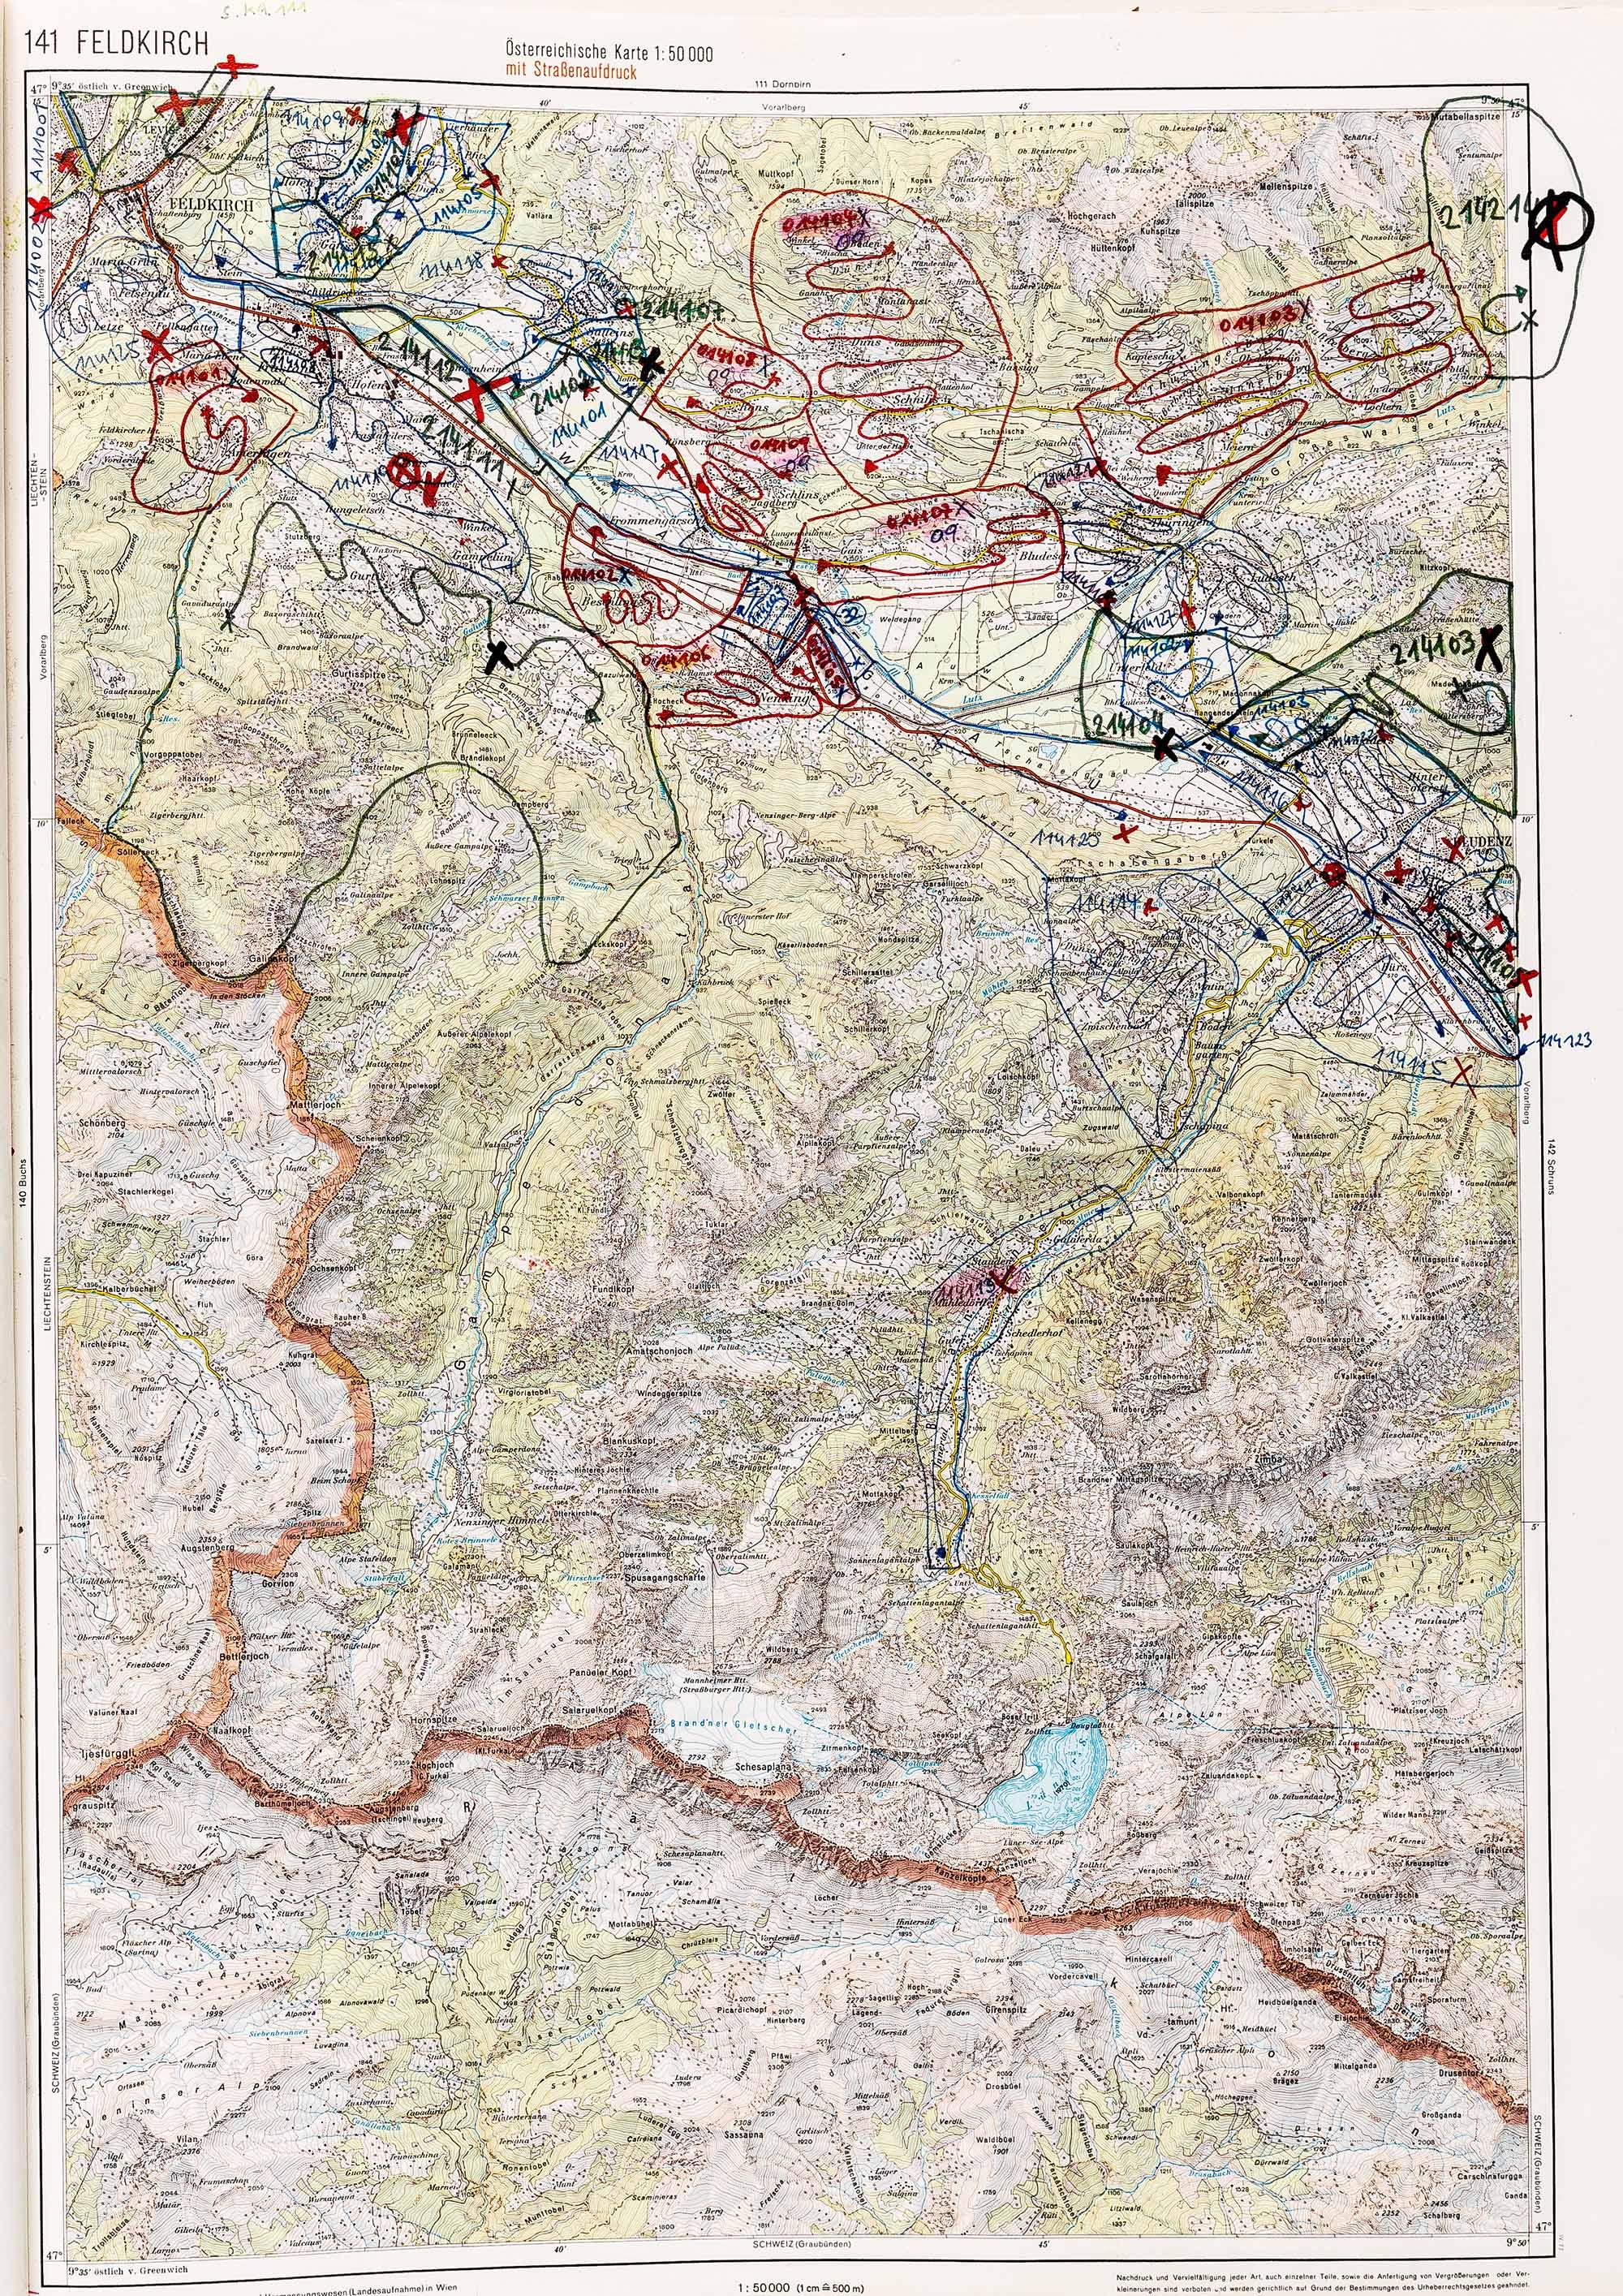 1979-1982 Karte 141